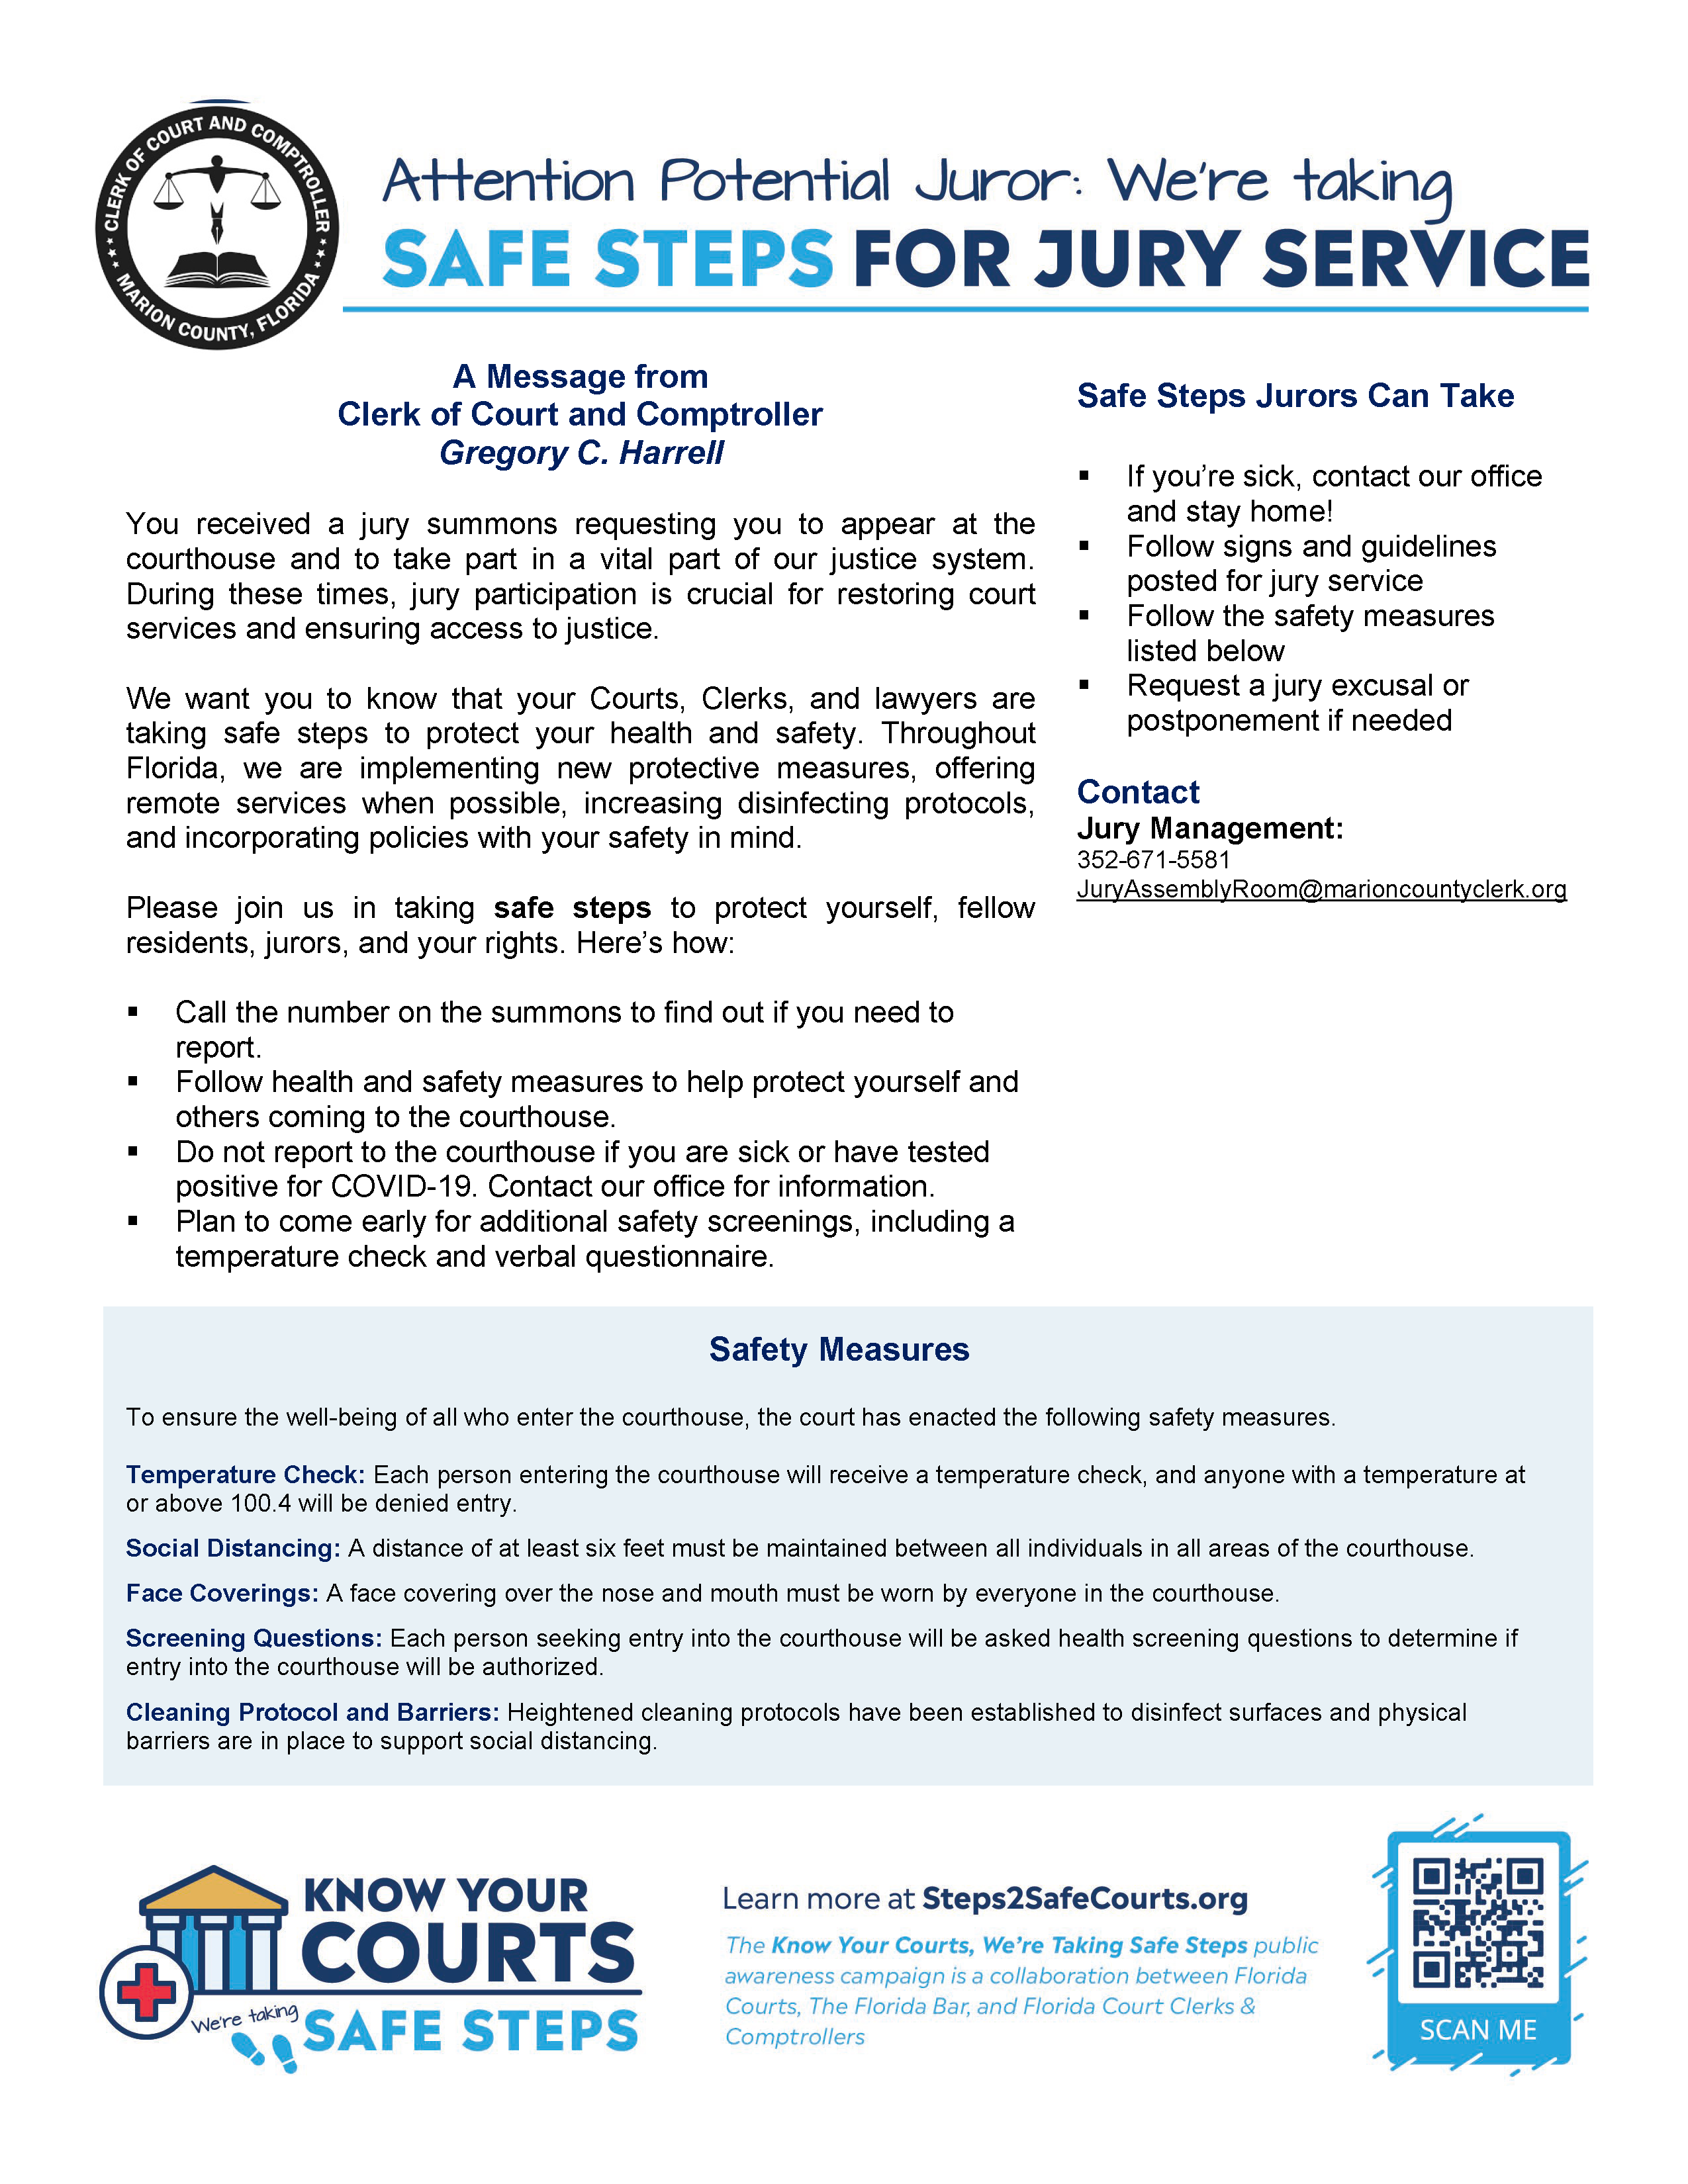 Safe Steps for Jury Duty